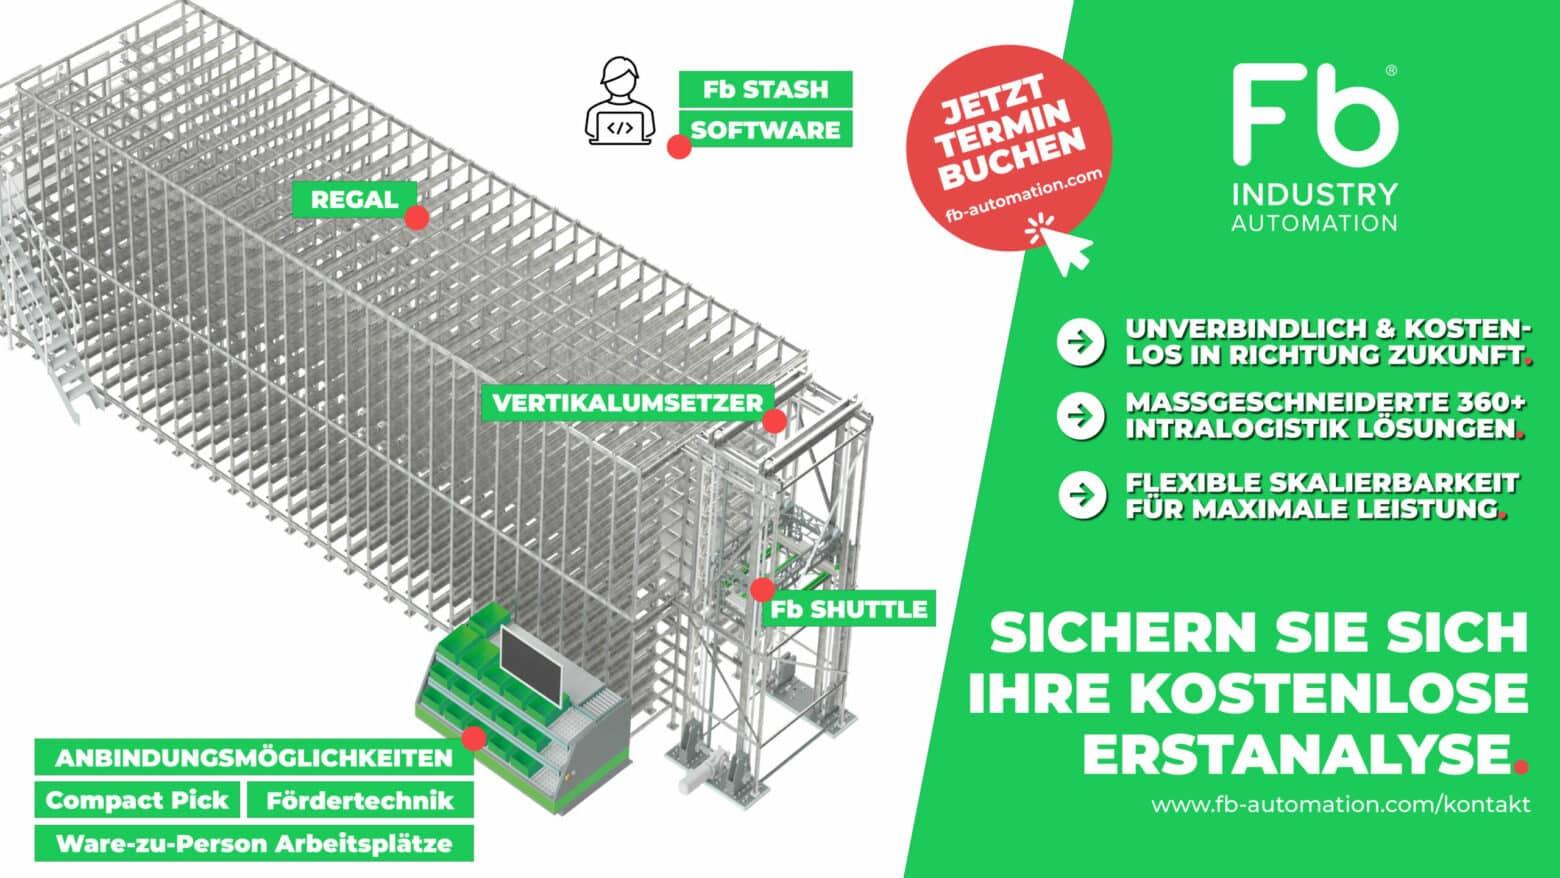 fb-kompaktlager-header-intralogistik-fb-industry-automation